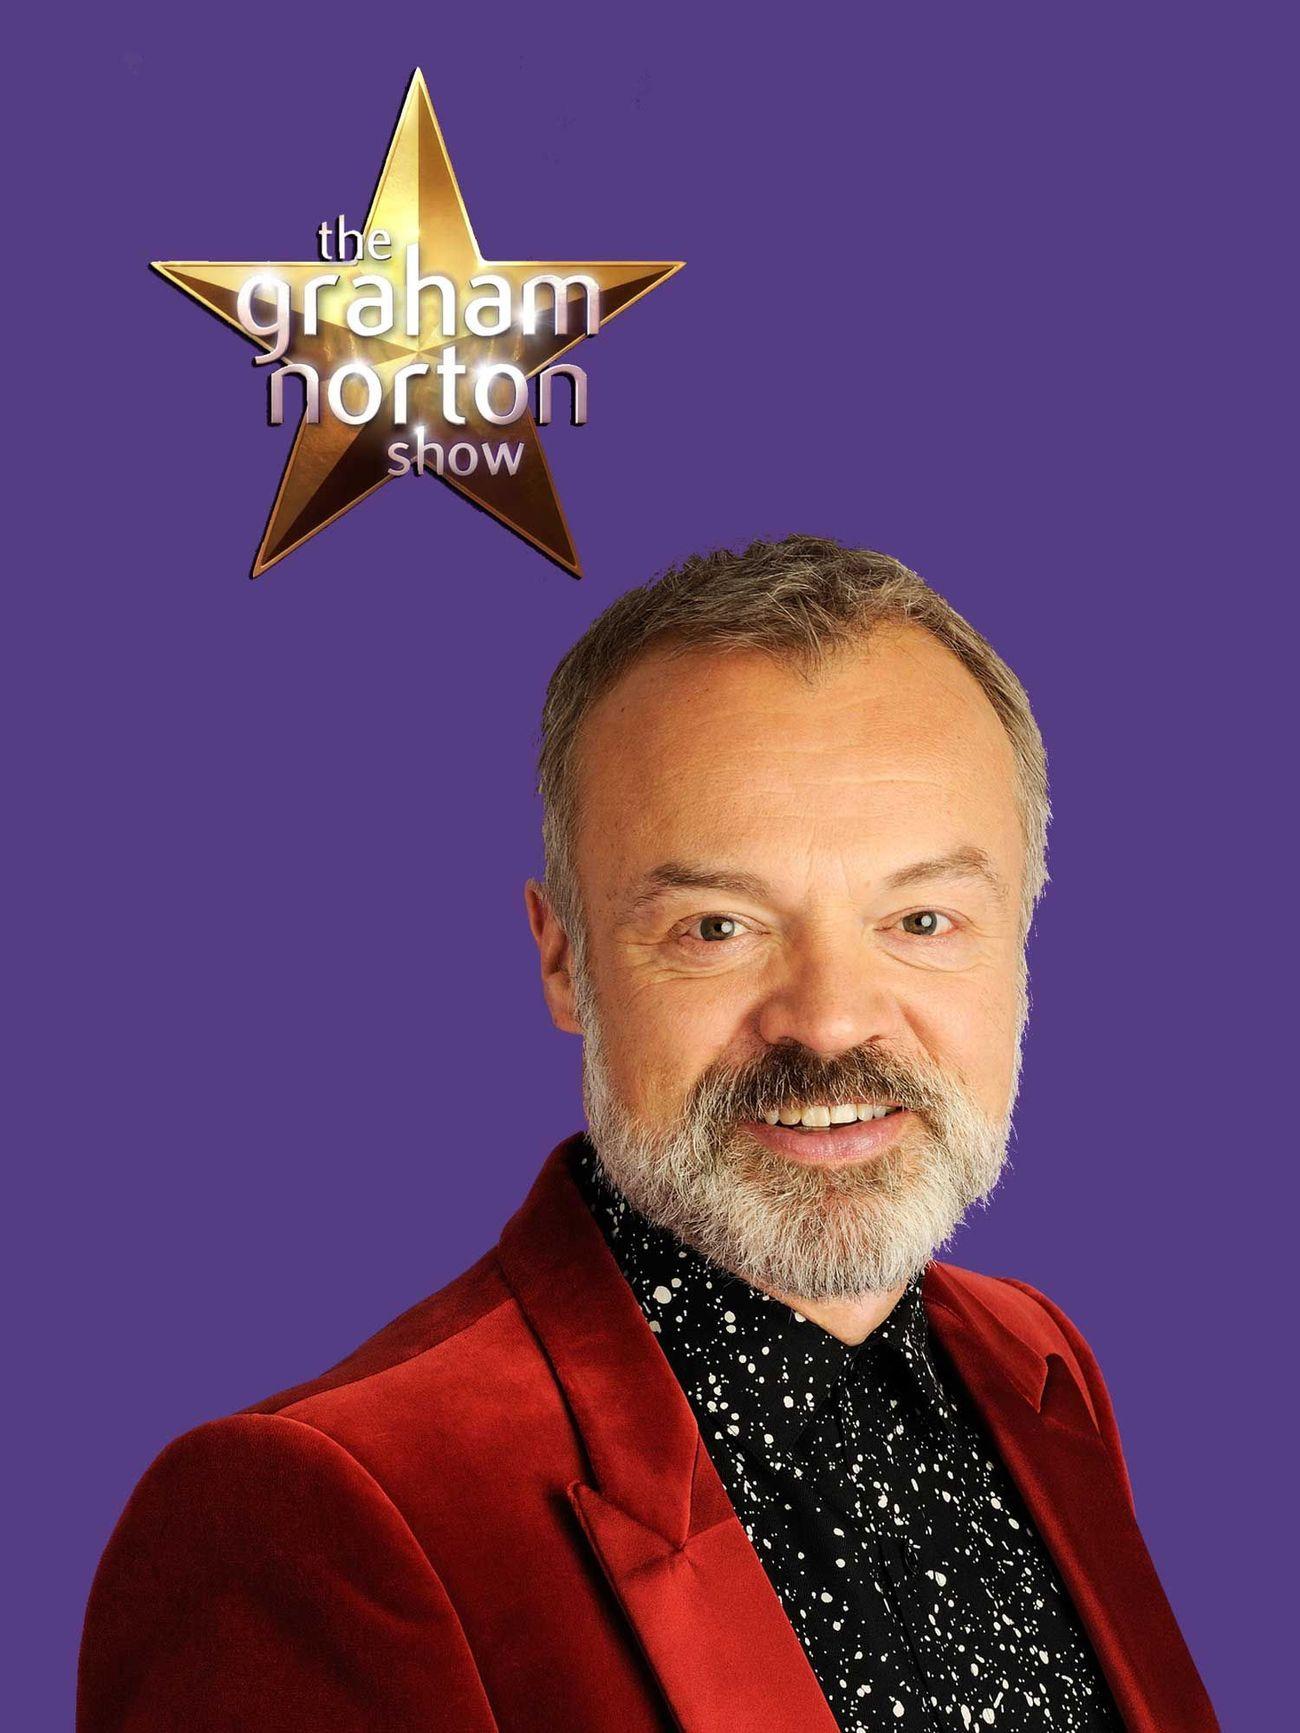 The.Graham.Norton.Show.S26E18.720p.HDTV.x264-QPEL